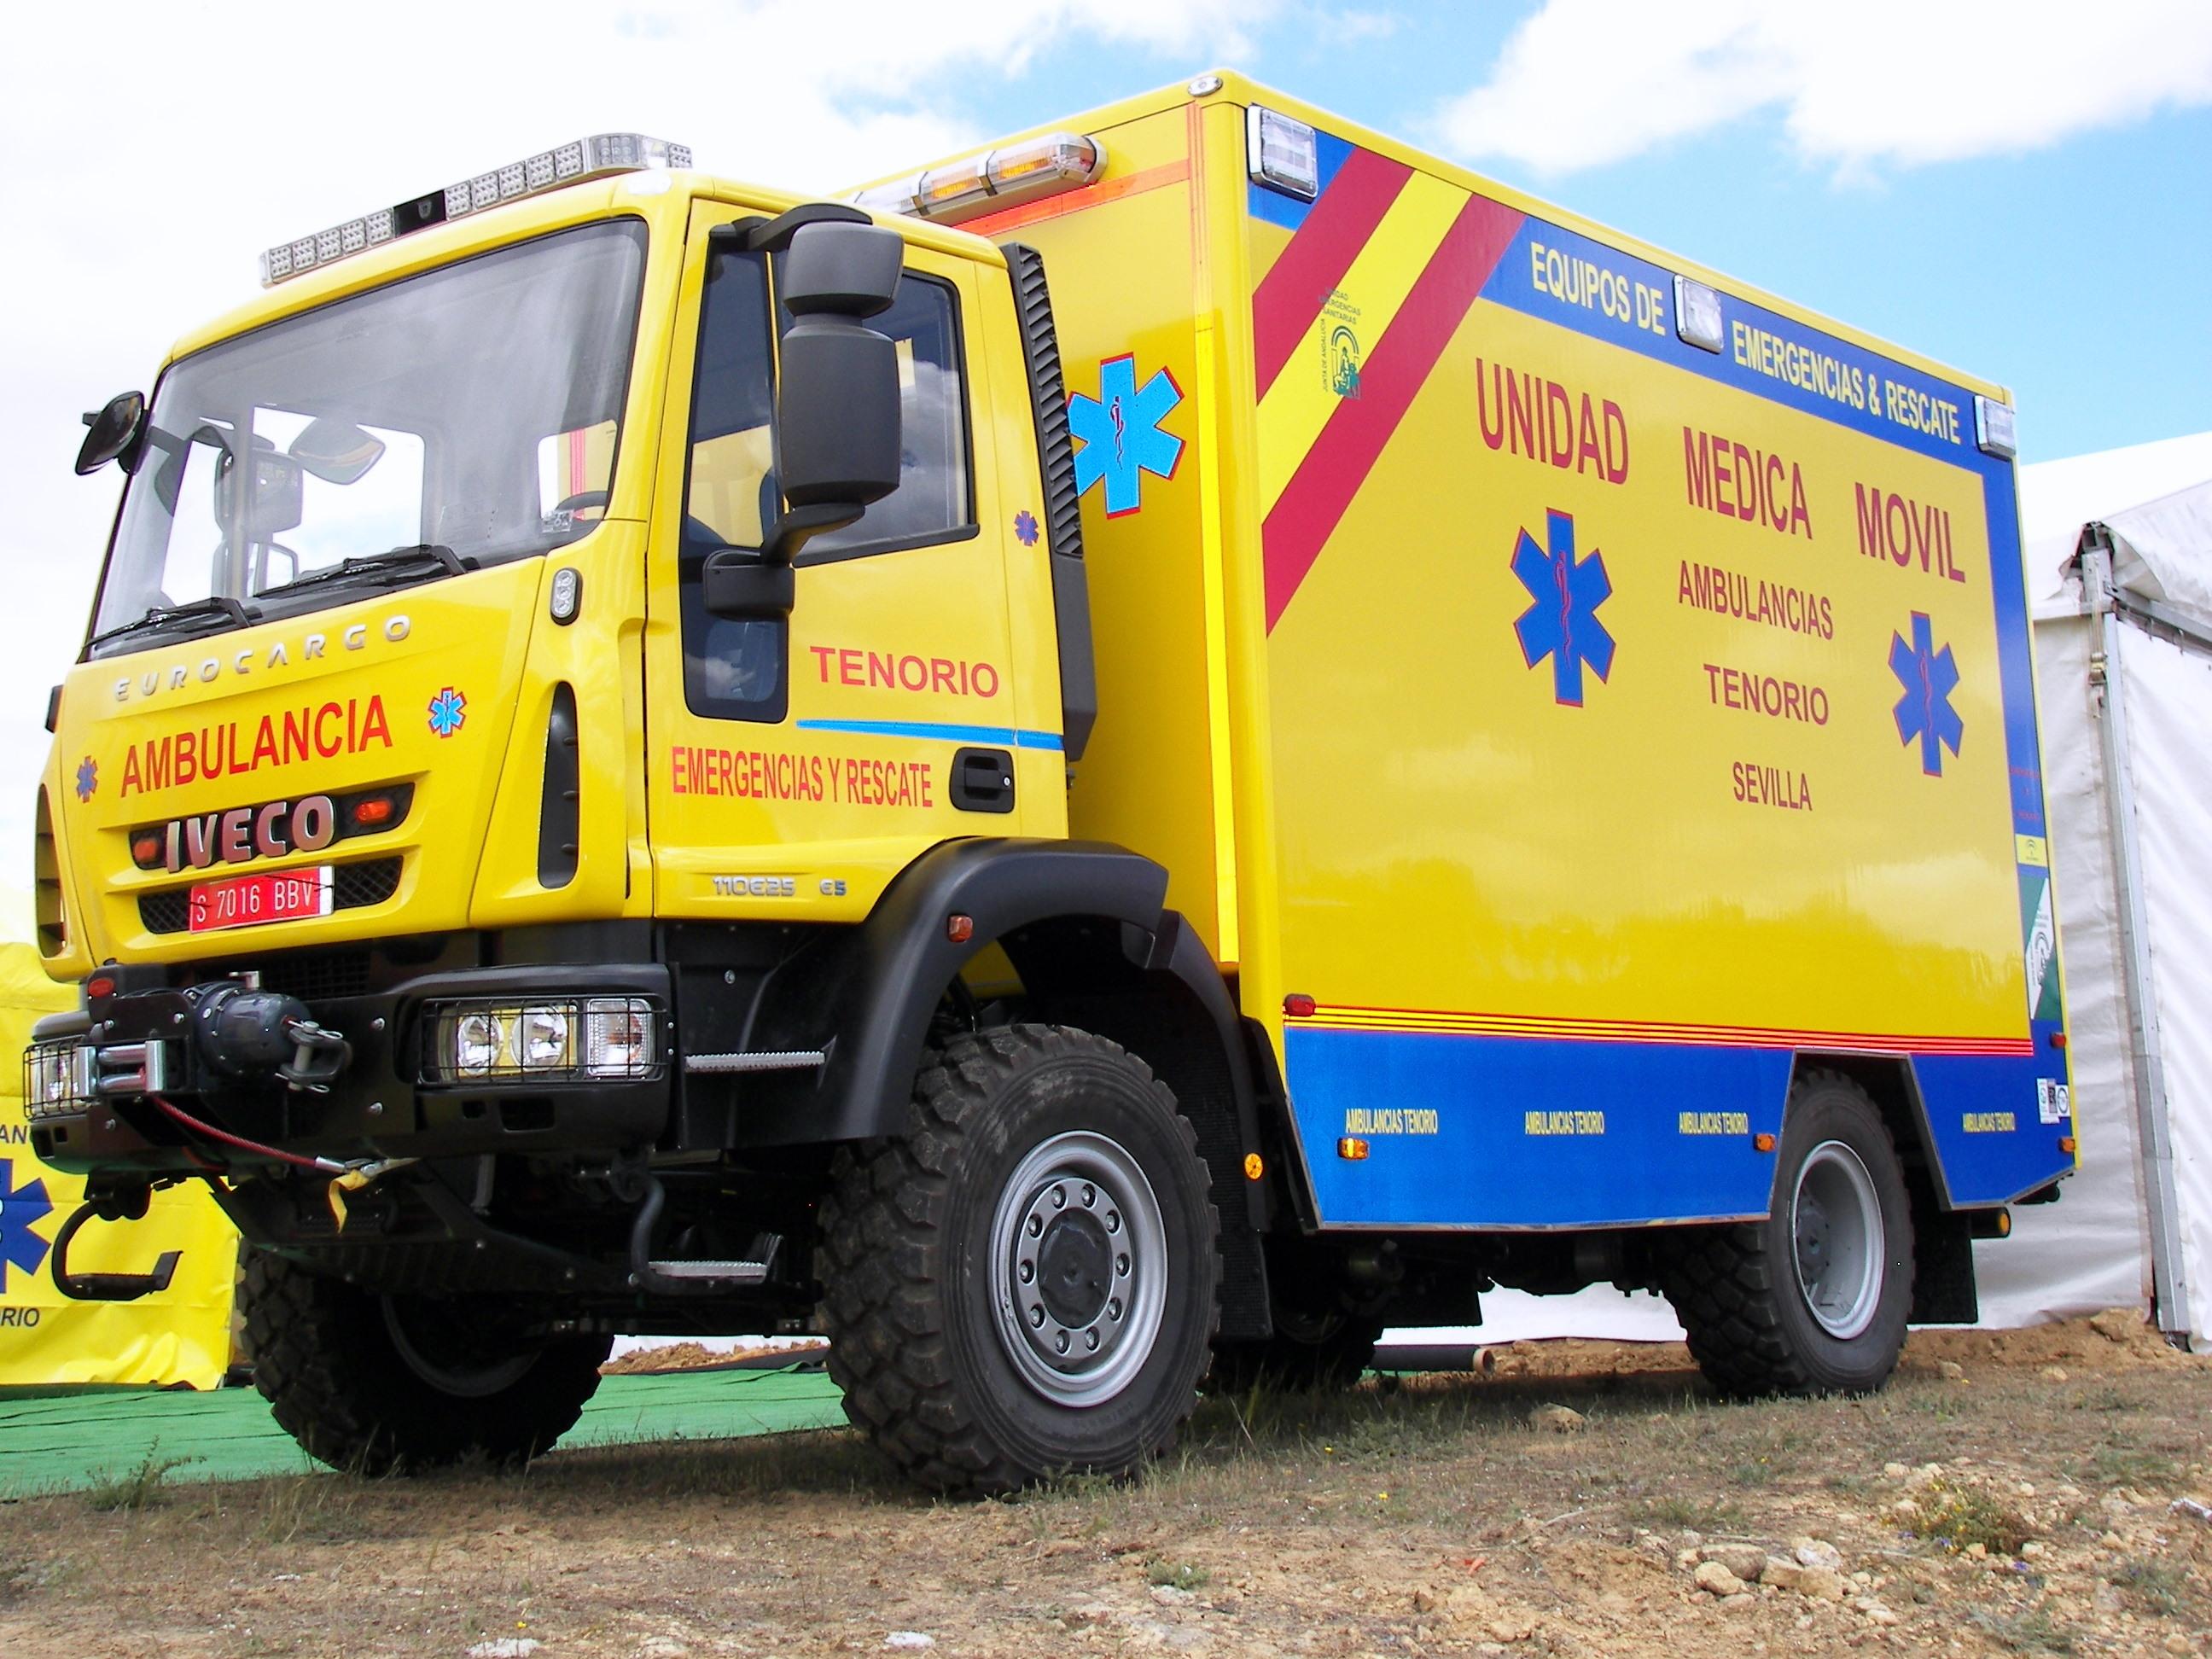 https://ambulanciastenorio.com/wp-content/uploads/2015/04/102_3806.jpg